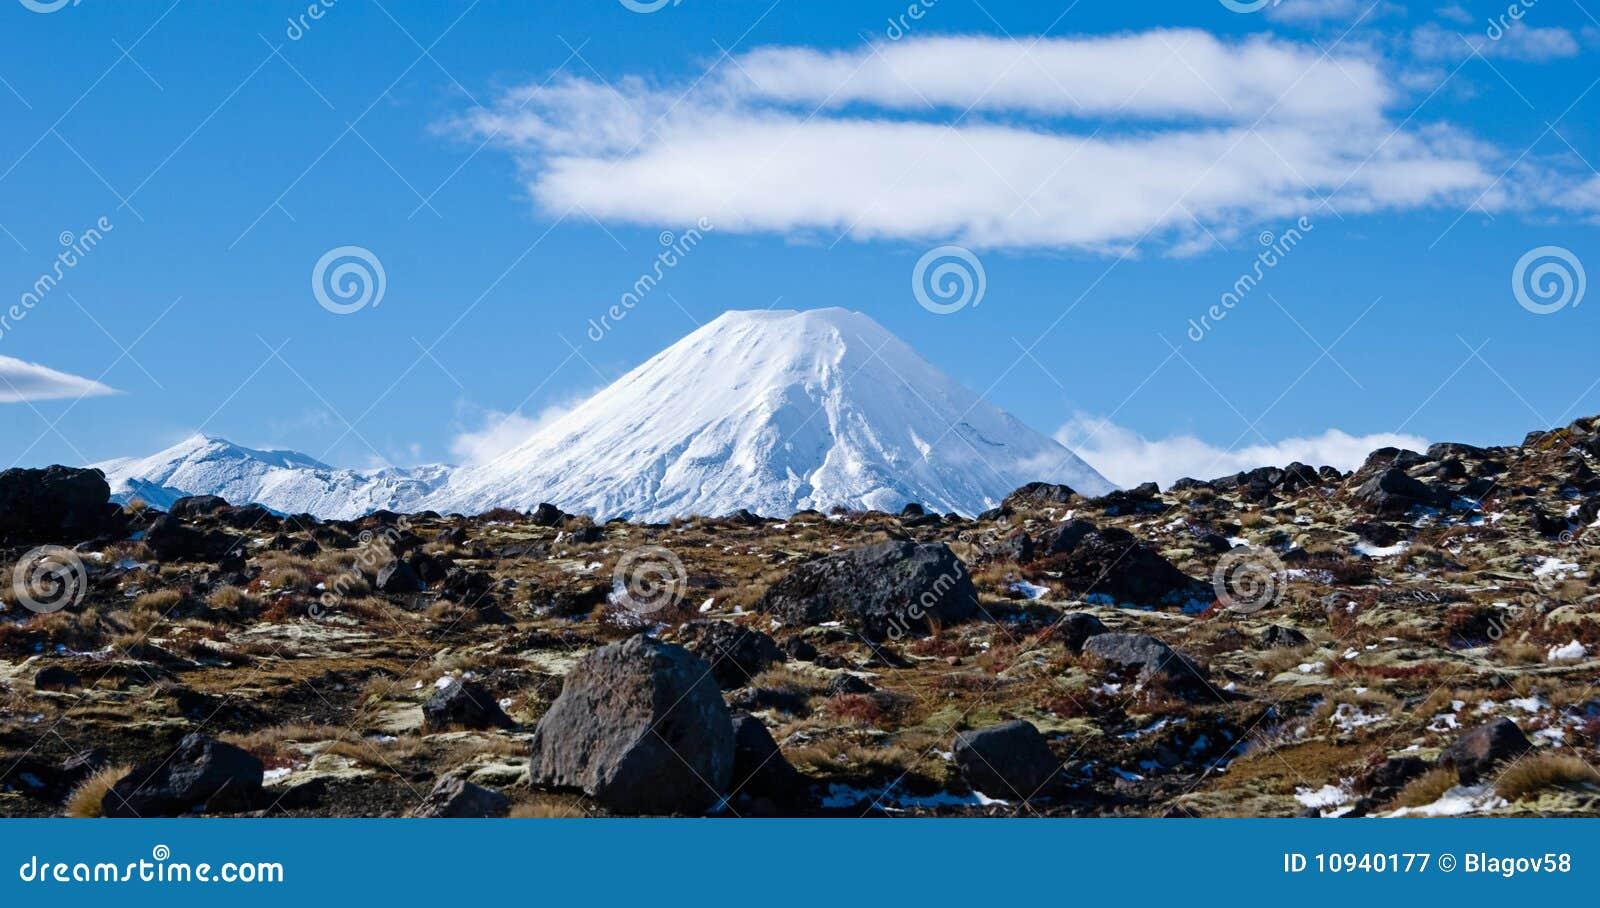 активный вулкан взгляда дороги ngaruahoe